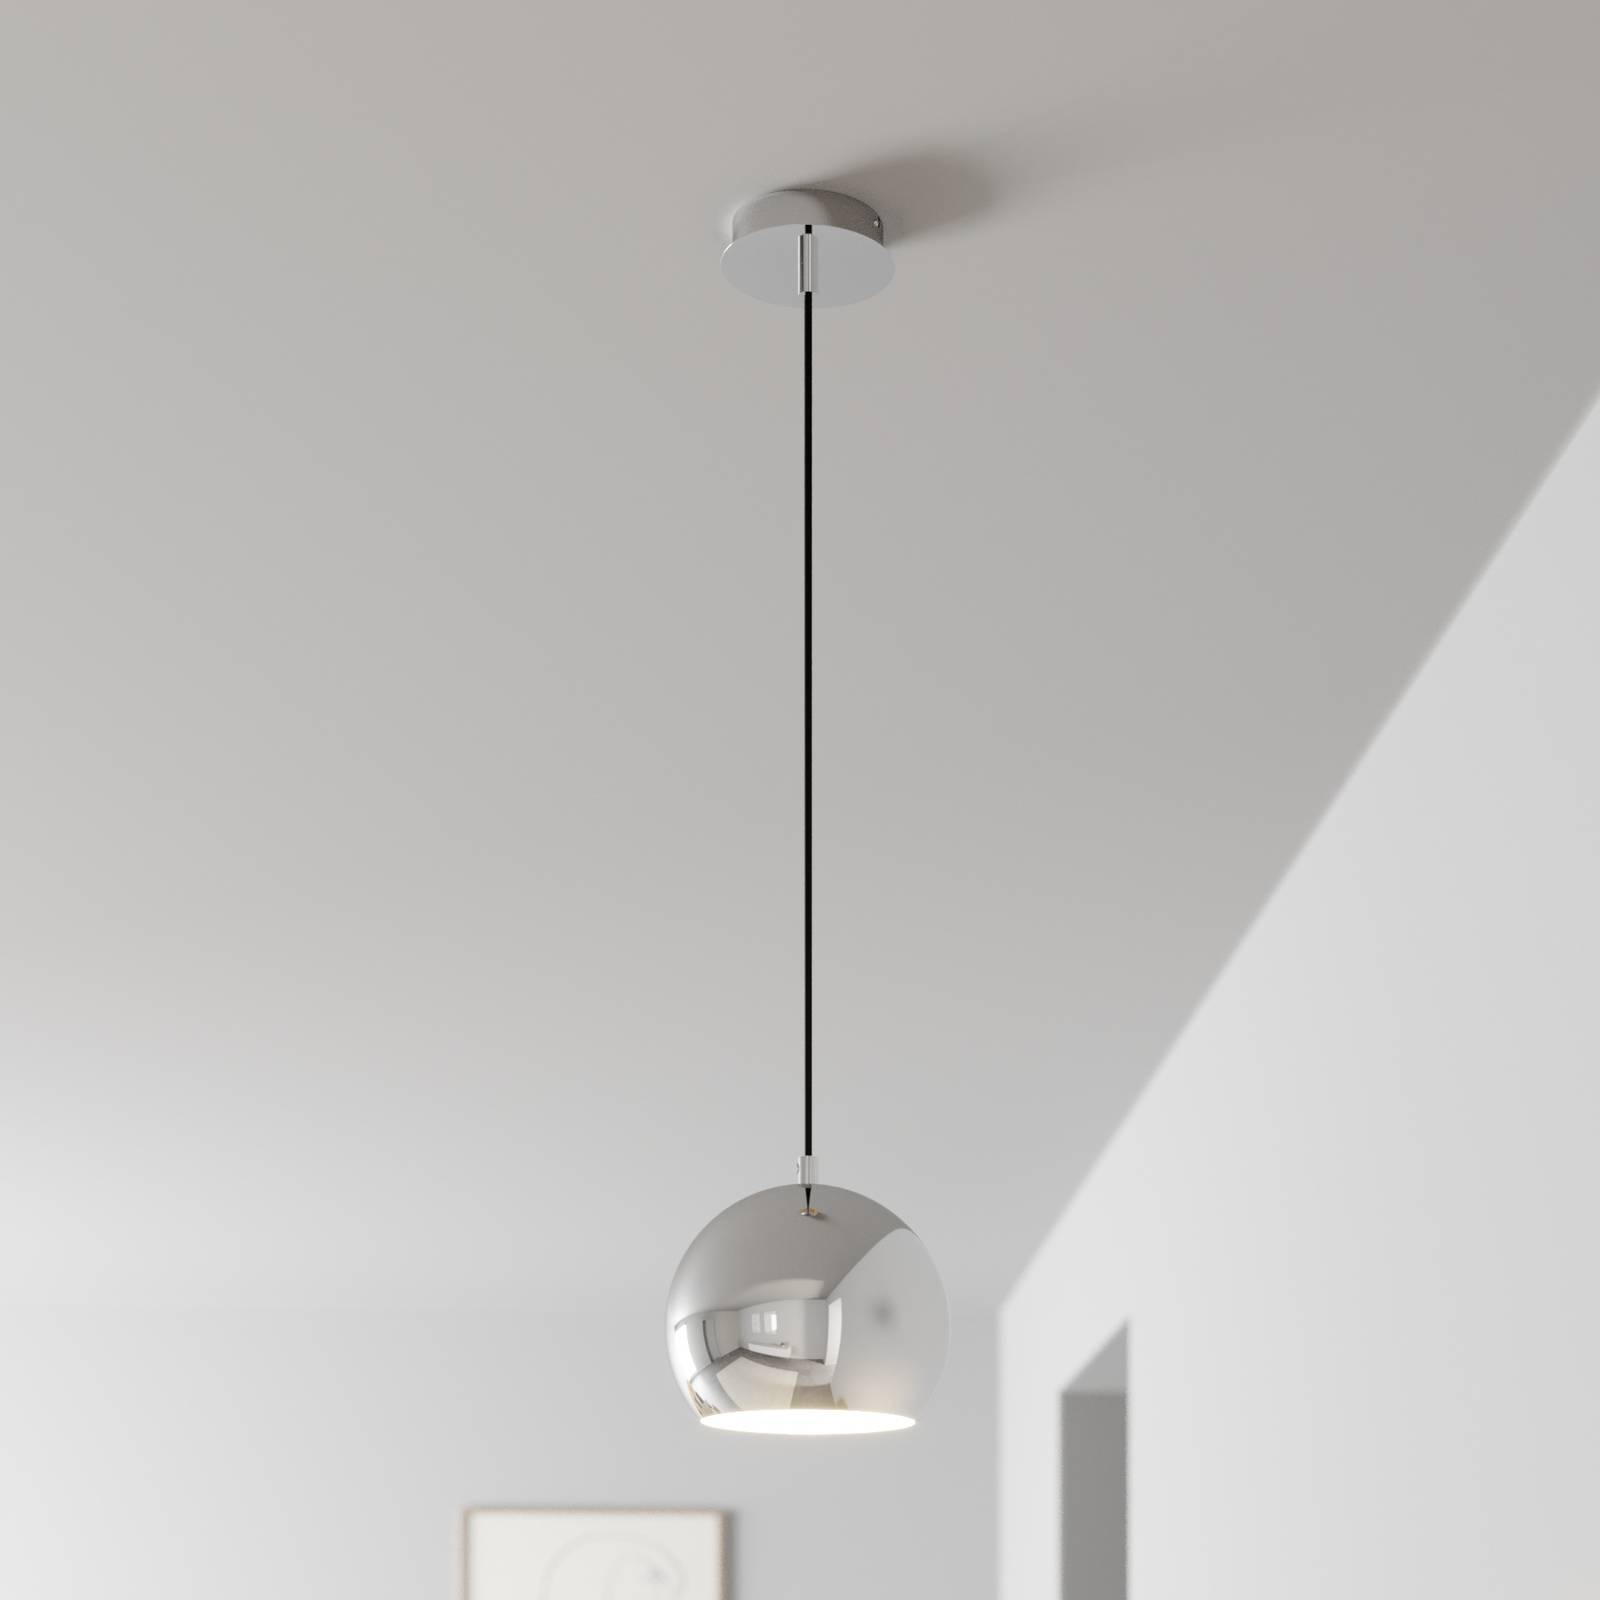 Lampa wisząca Cool, 1-punktowa, chrom